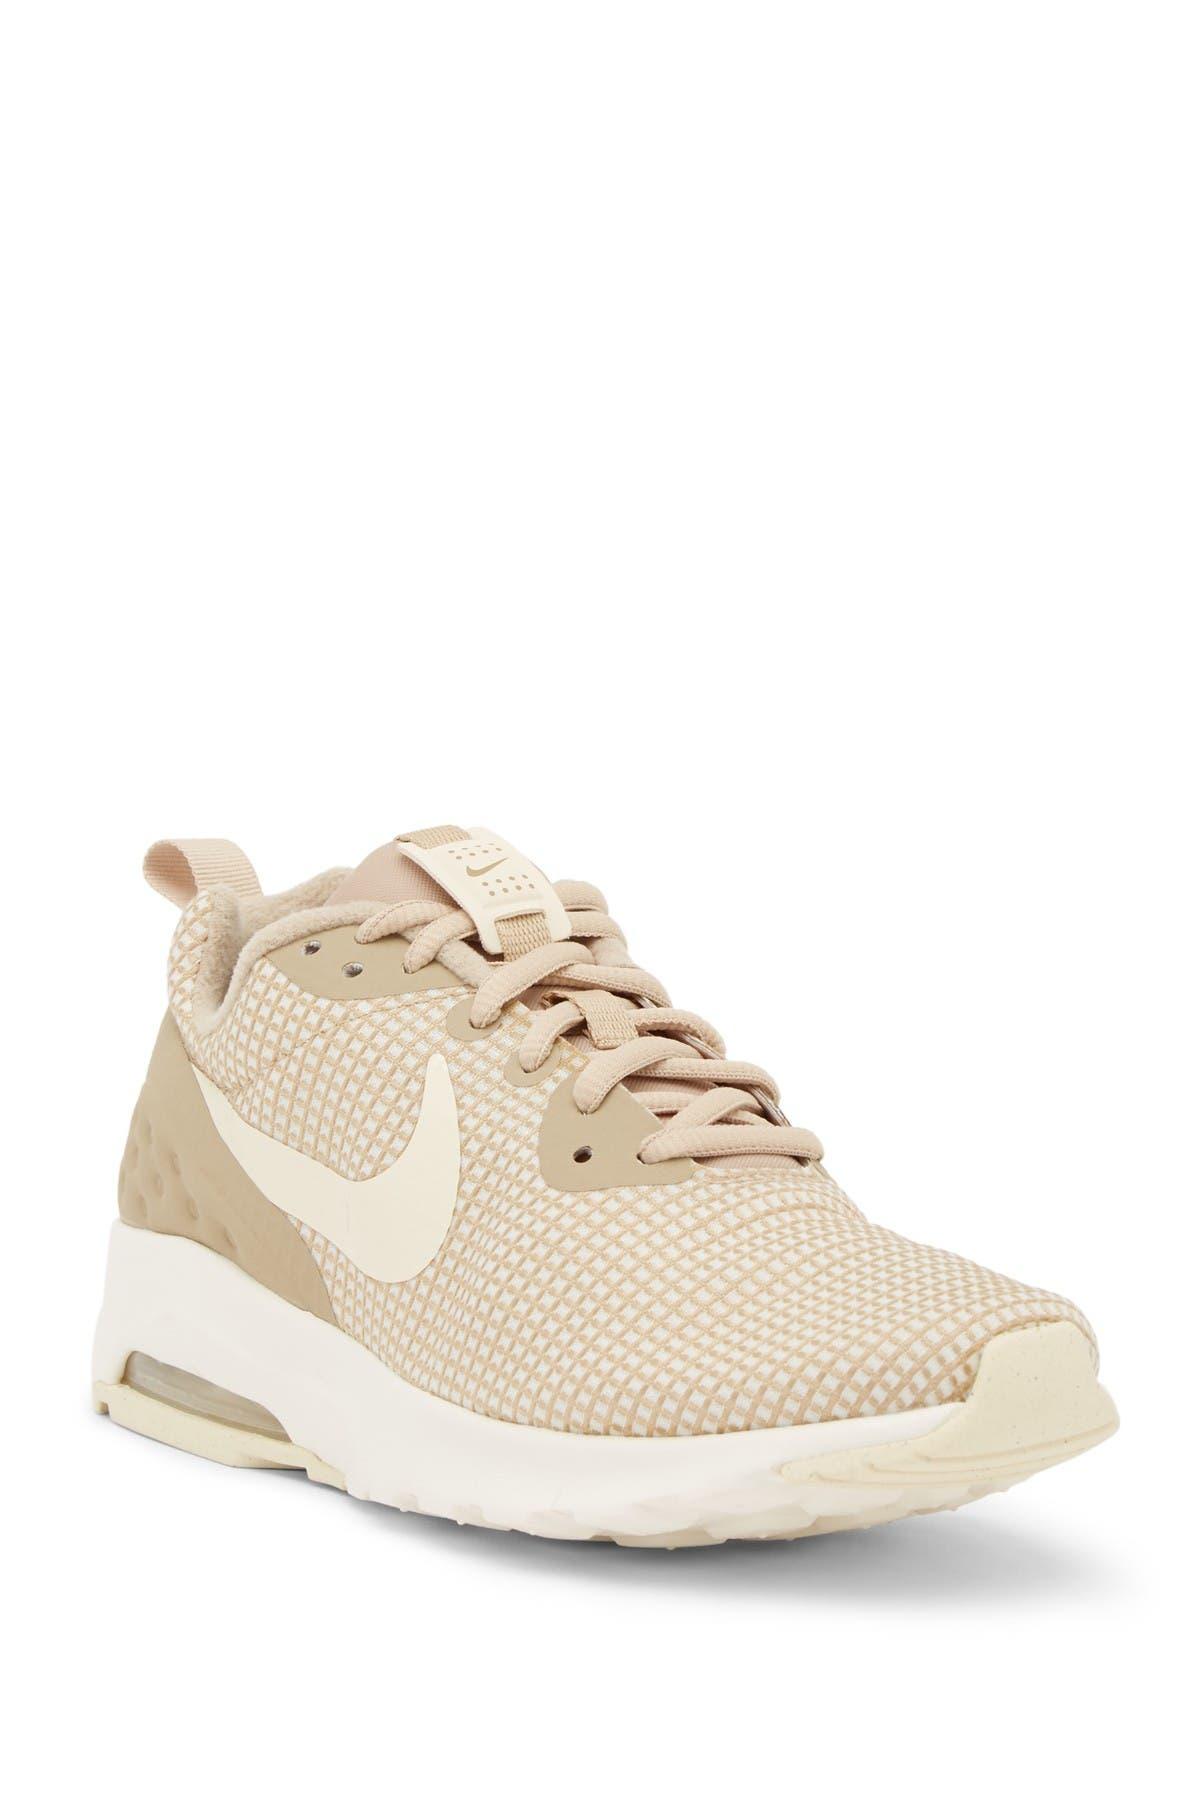 Image of Nike Air Max Motion Sneaker